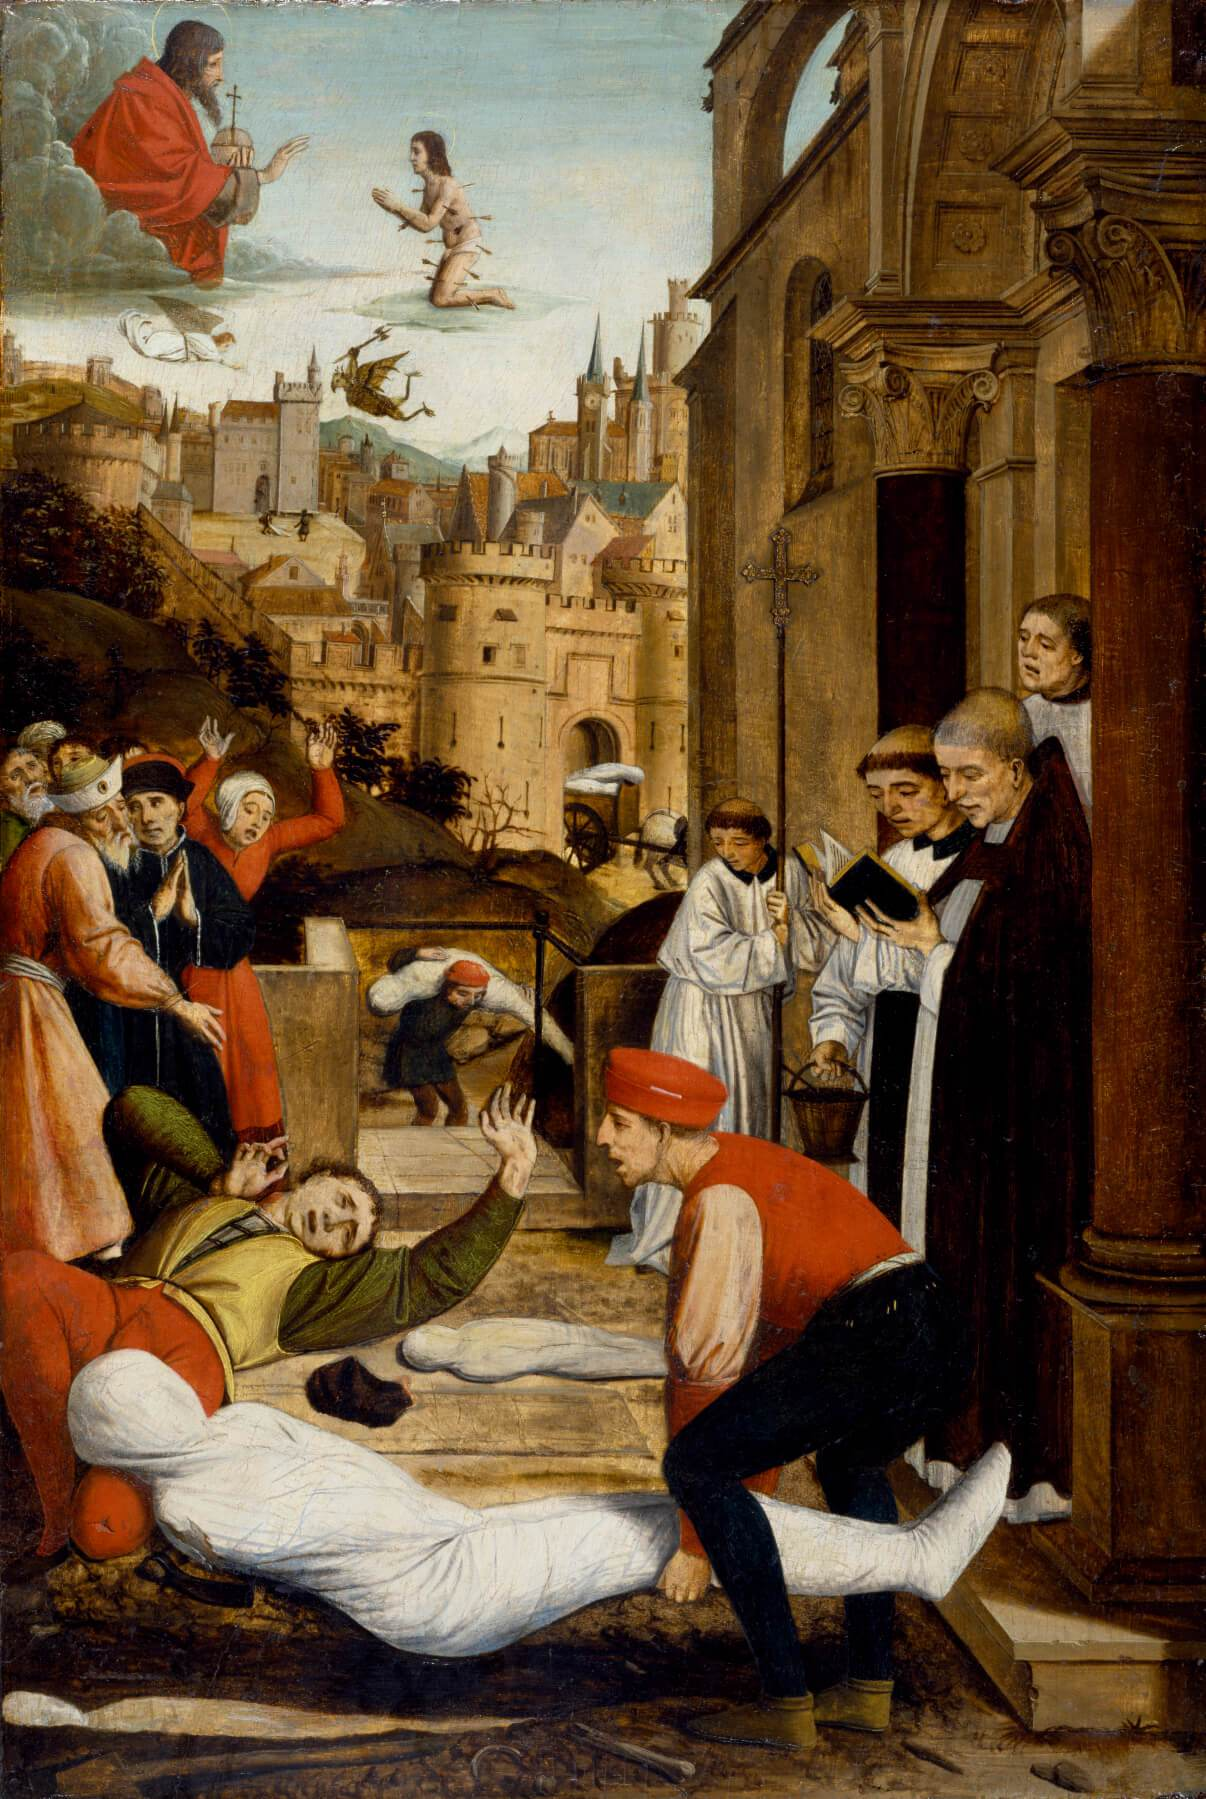 josse-liefrerinx-saint-sebastian-interceding-for-the-plague-stricken-1497-99